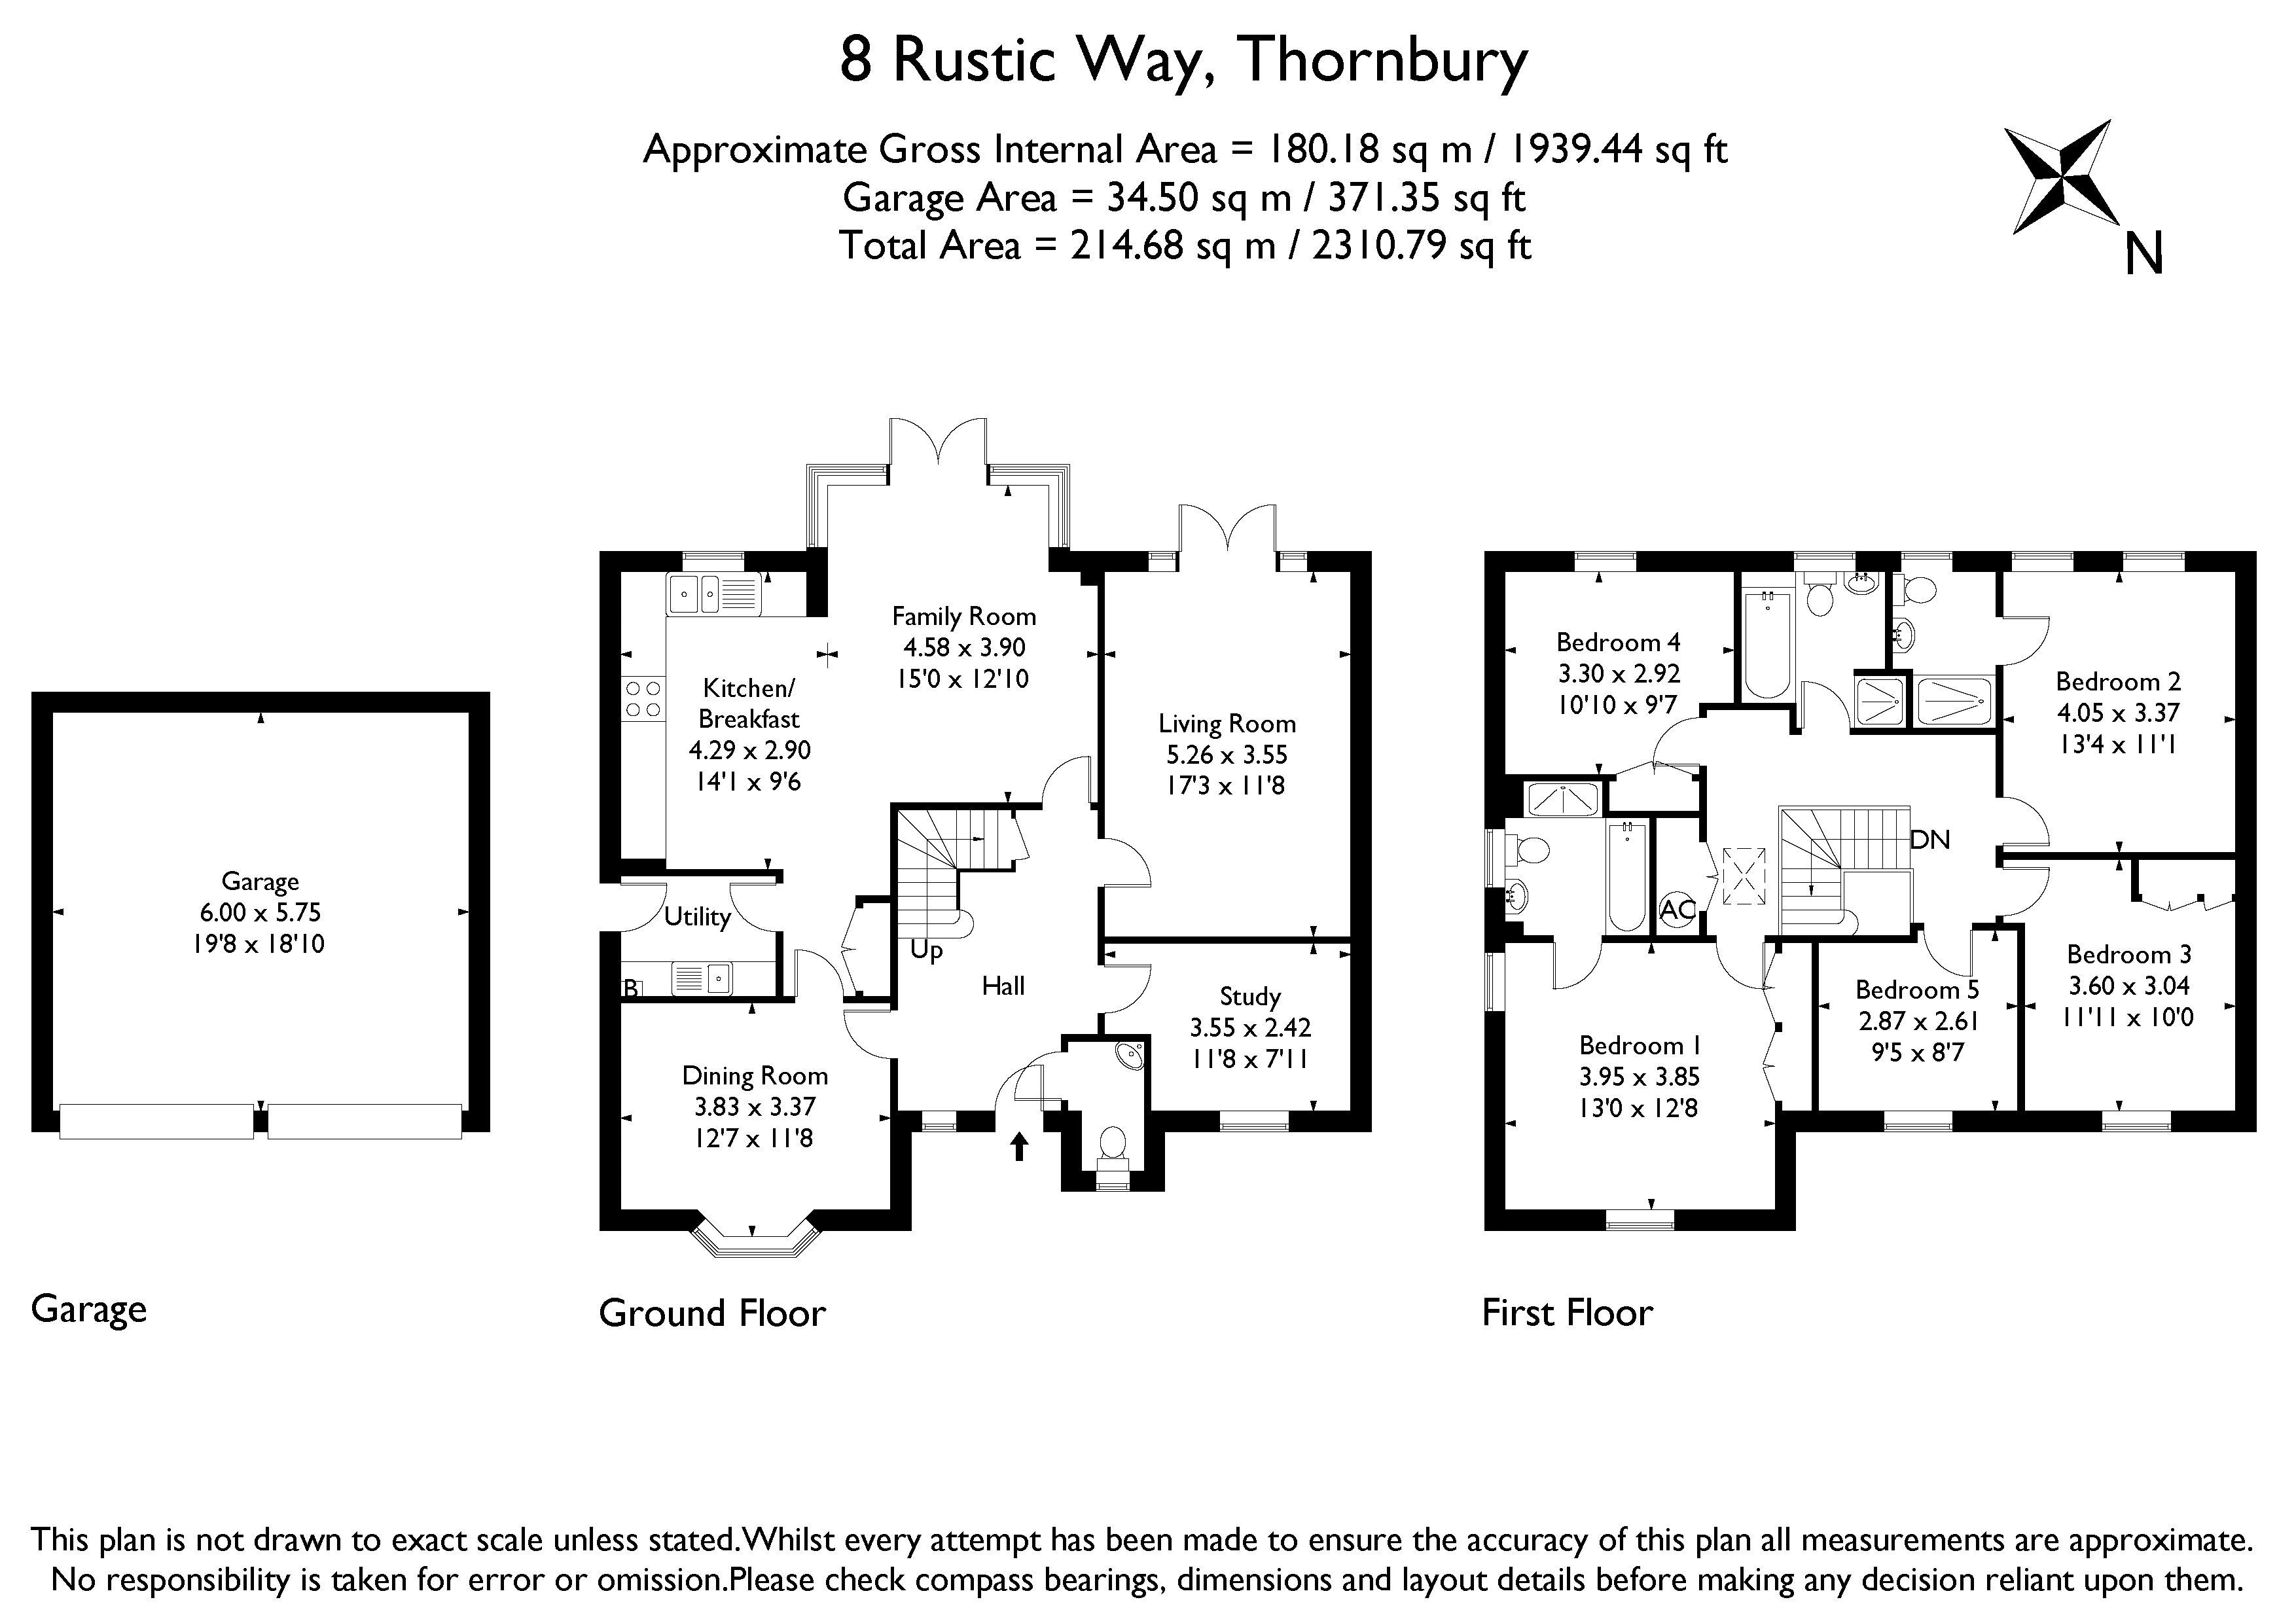 Rustic Way Thornbury